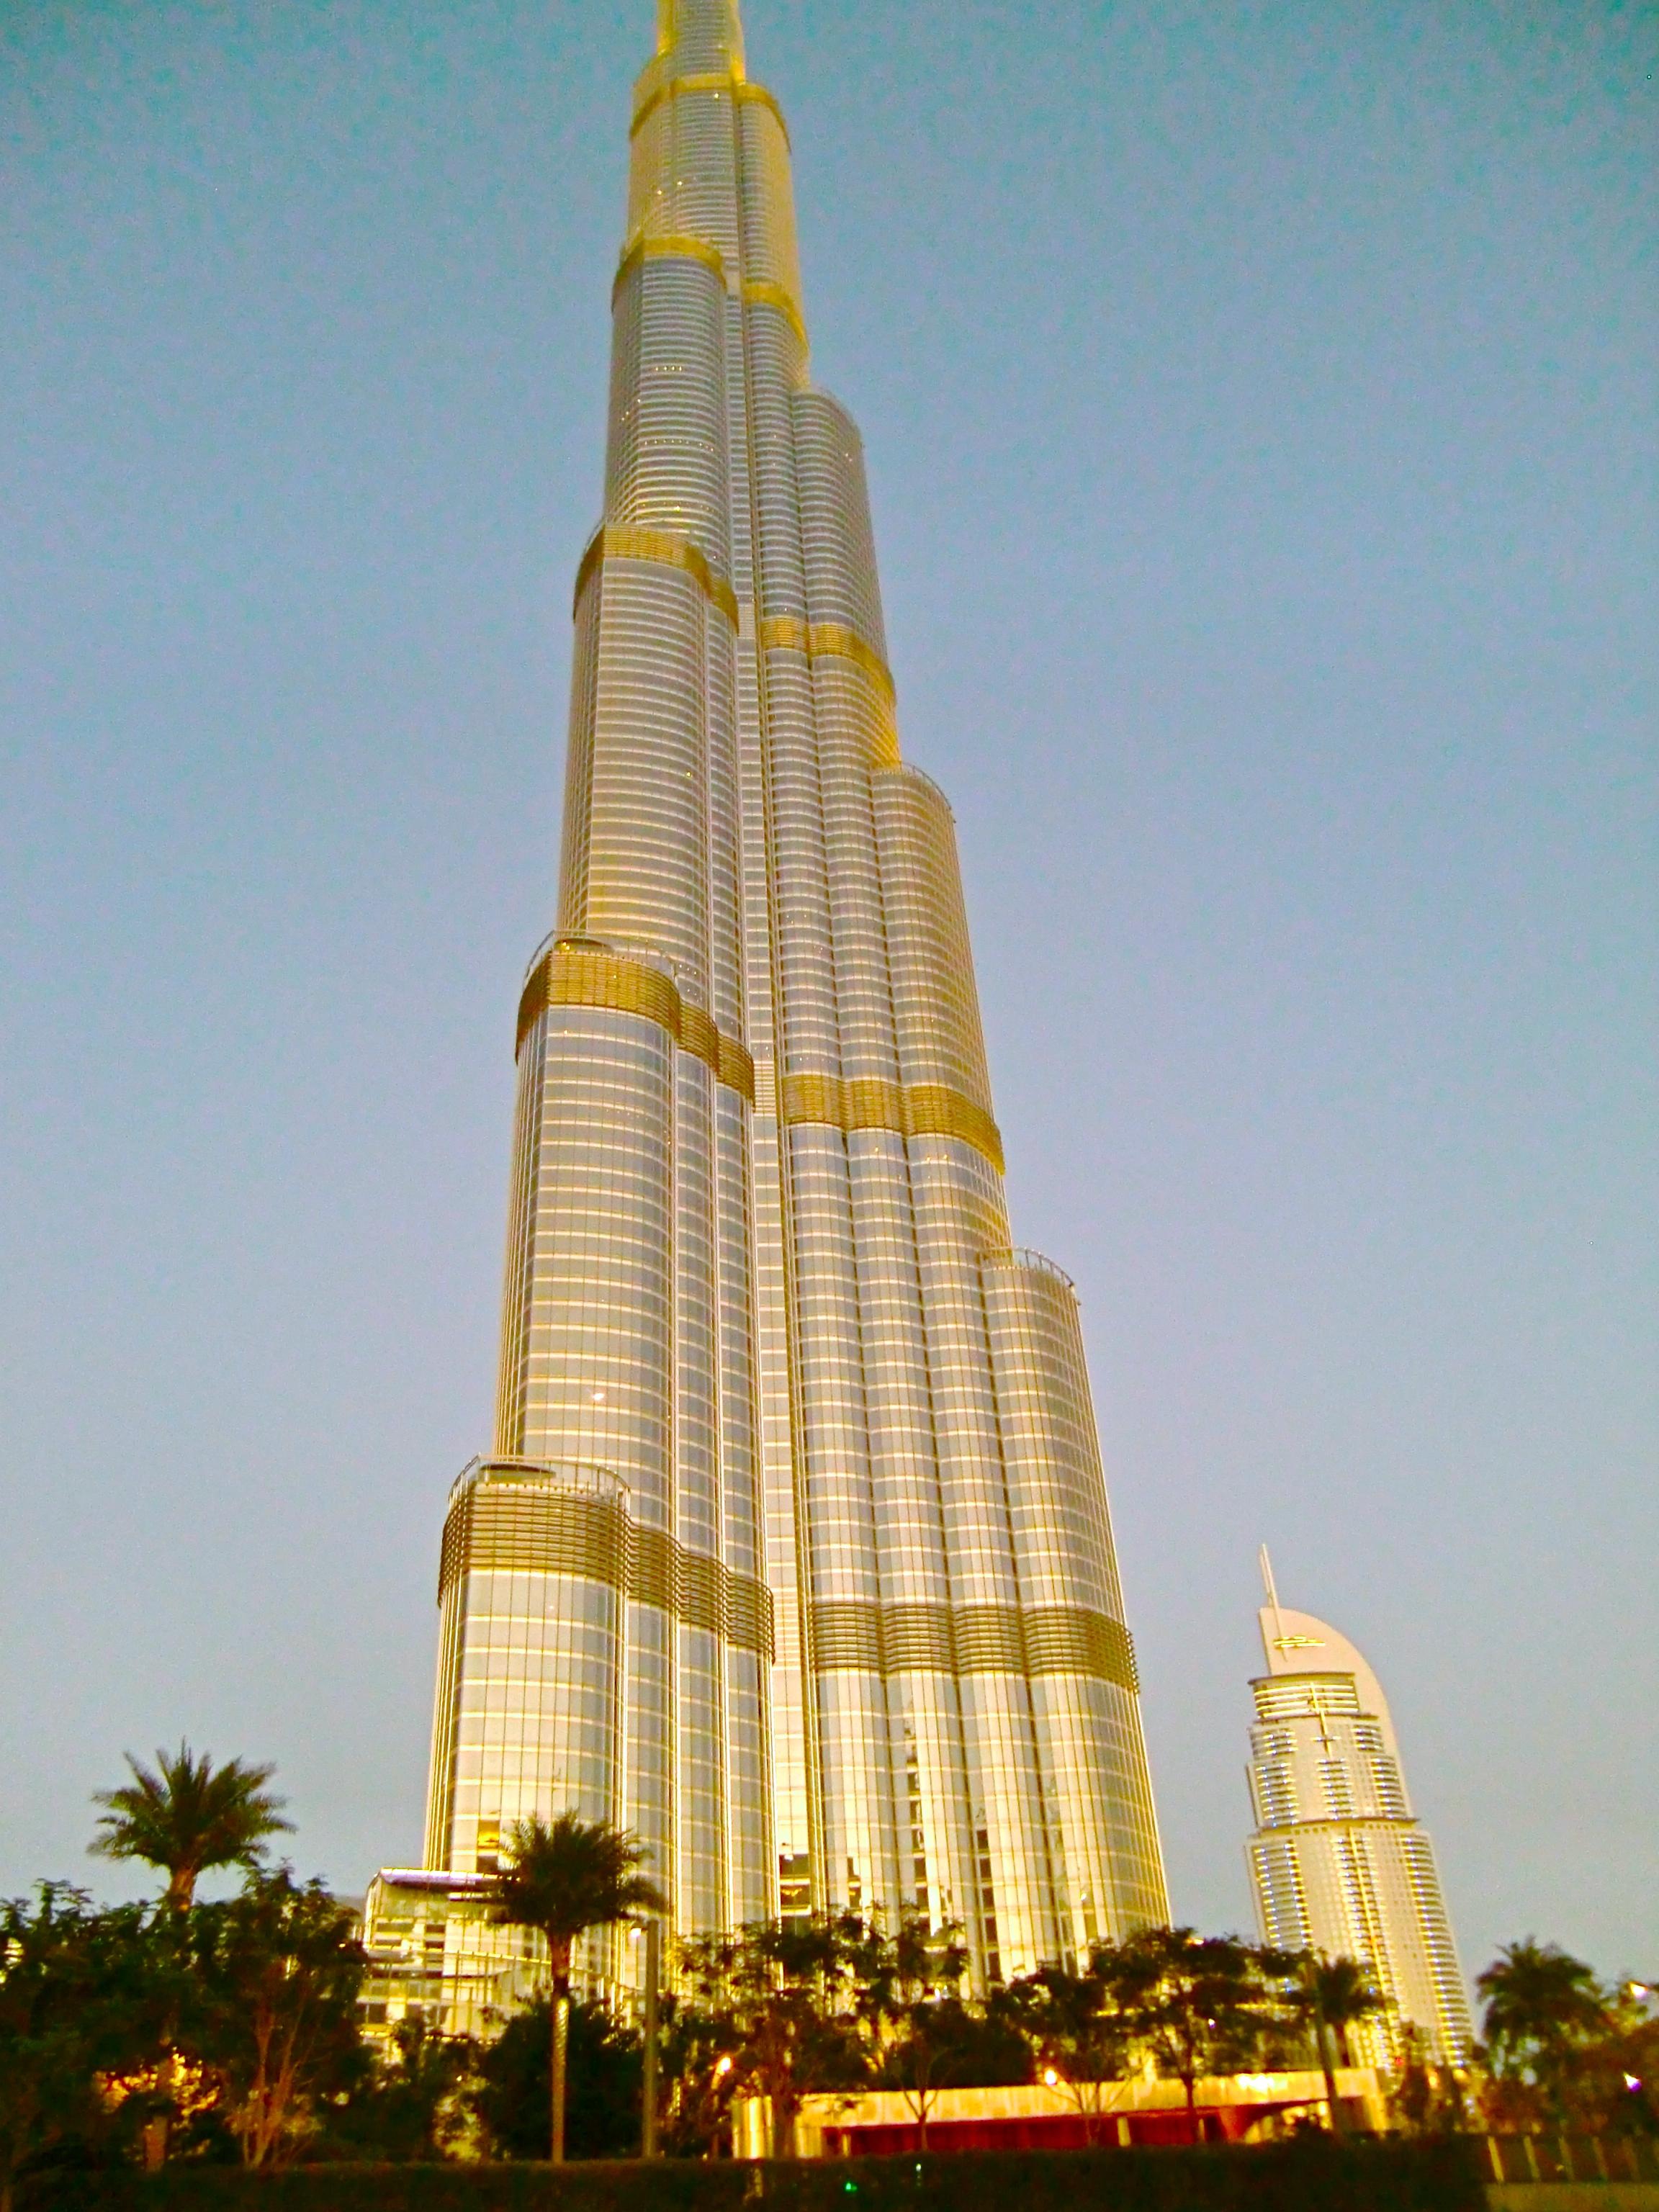 Burj khalifa liput